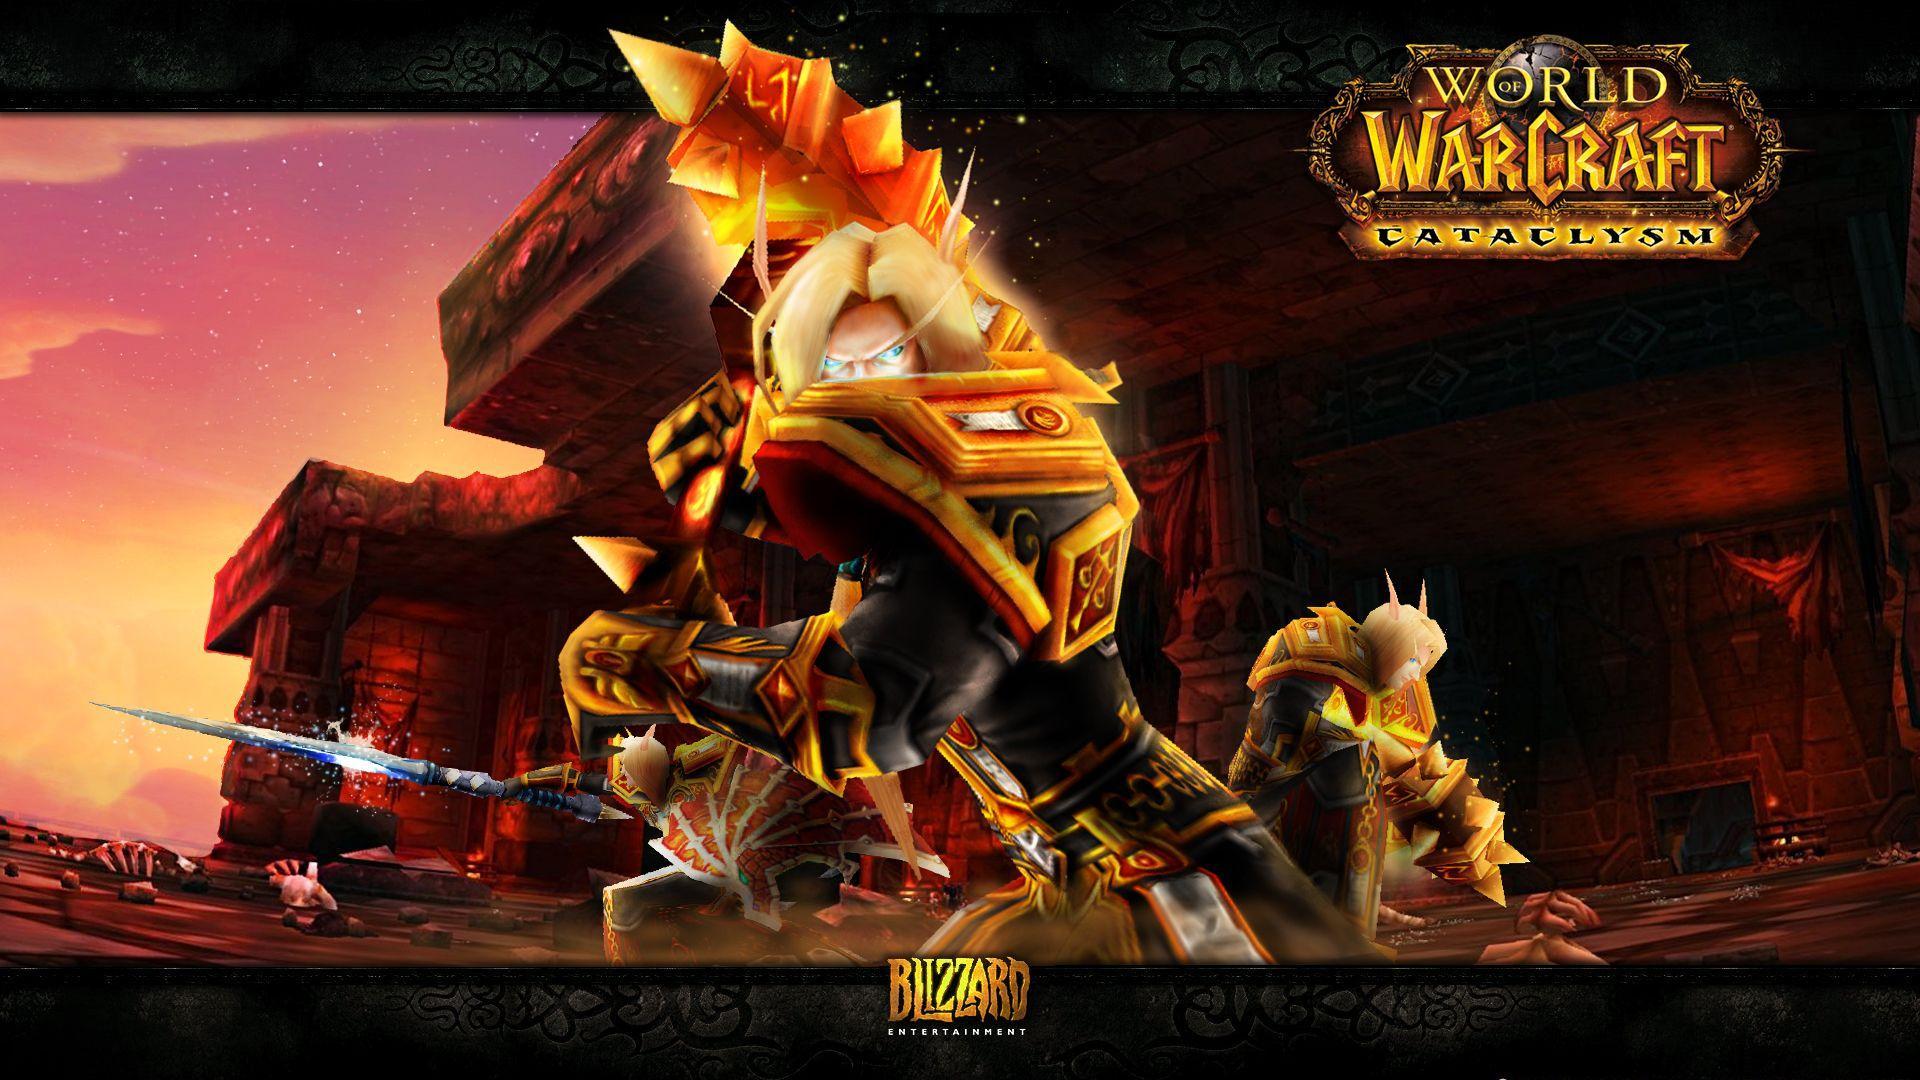 World Of Warcraft Wallpapers Hd Paladin Wallpaper Cave